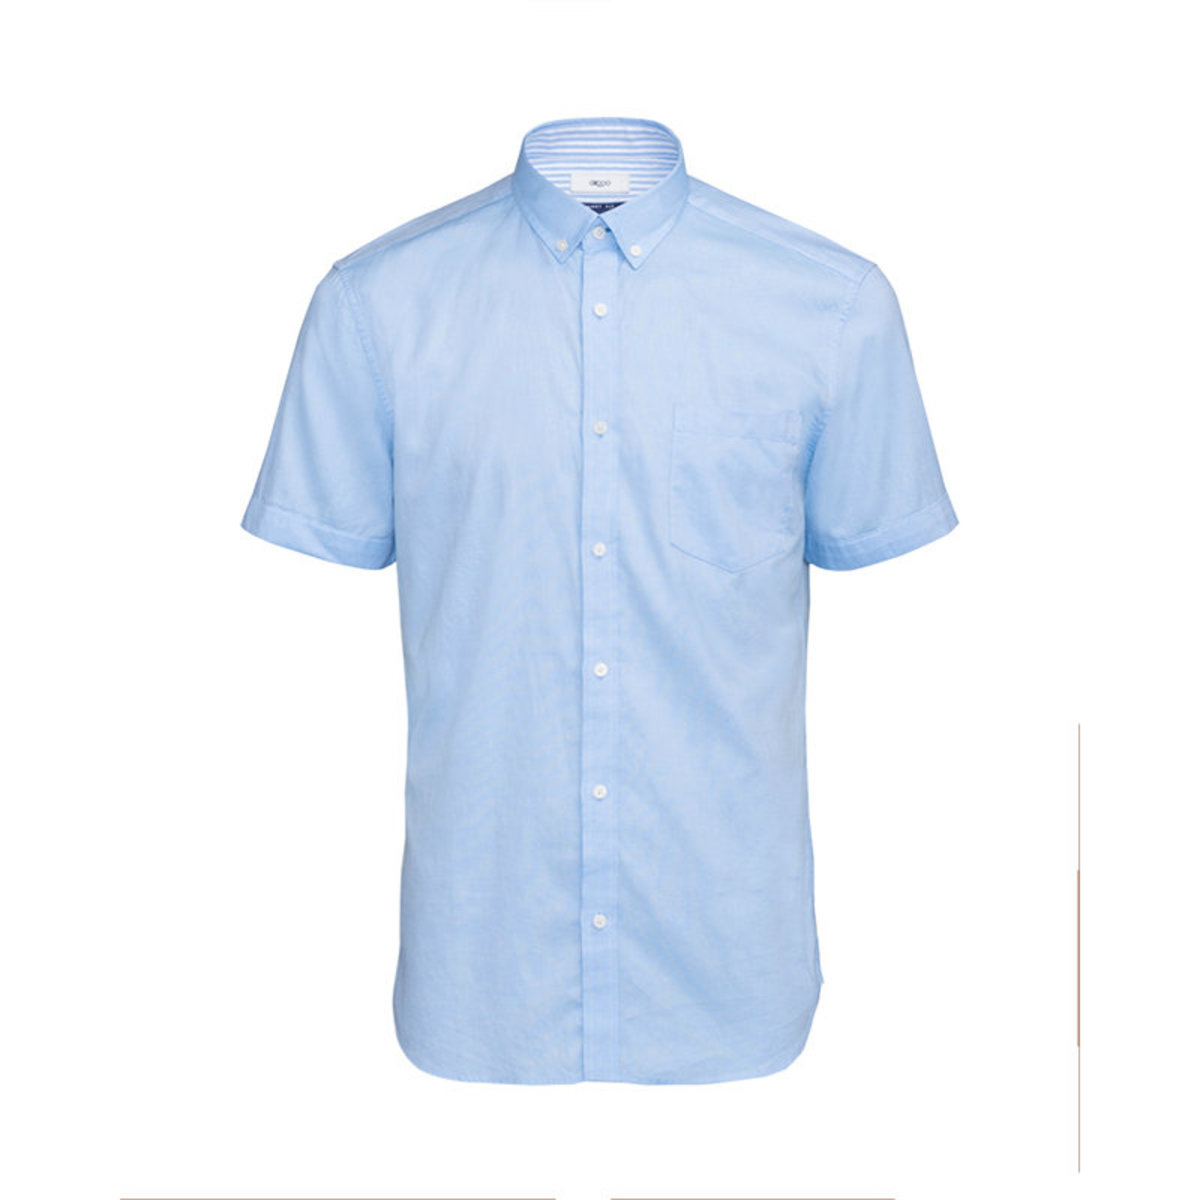 Men's Fine Cotton Oxford Short Sleeve Shirt (Blue Moon)